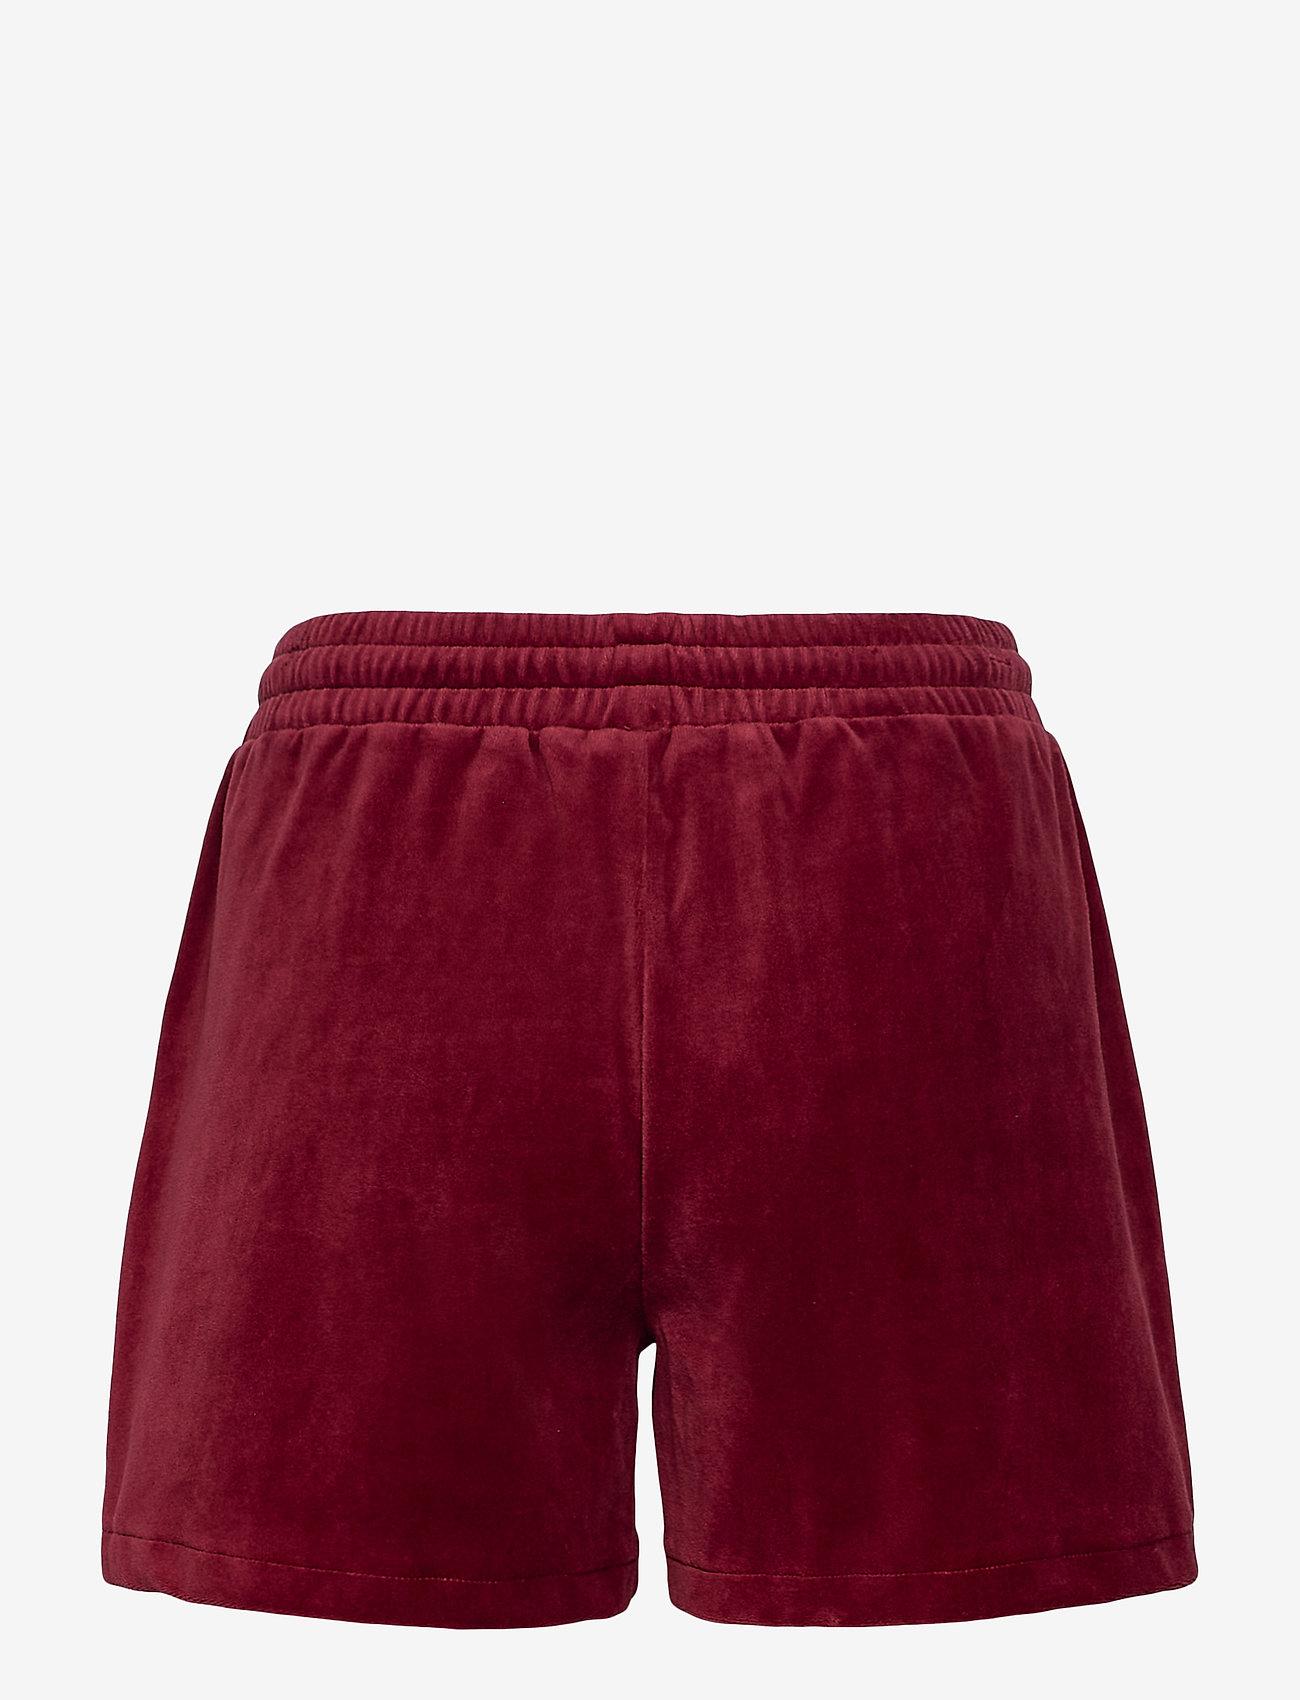 Rosemunde - Shorts - shorts casual - cabernet - 1